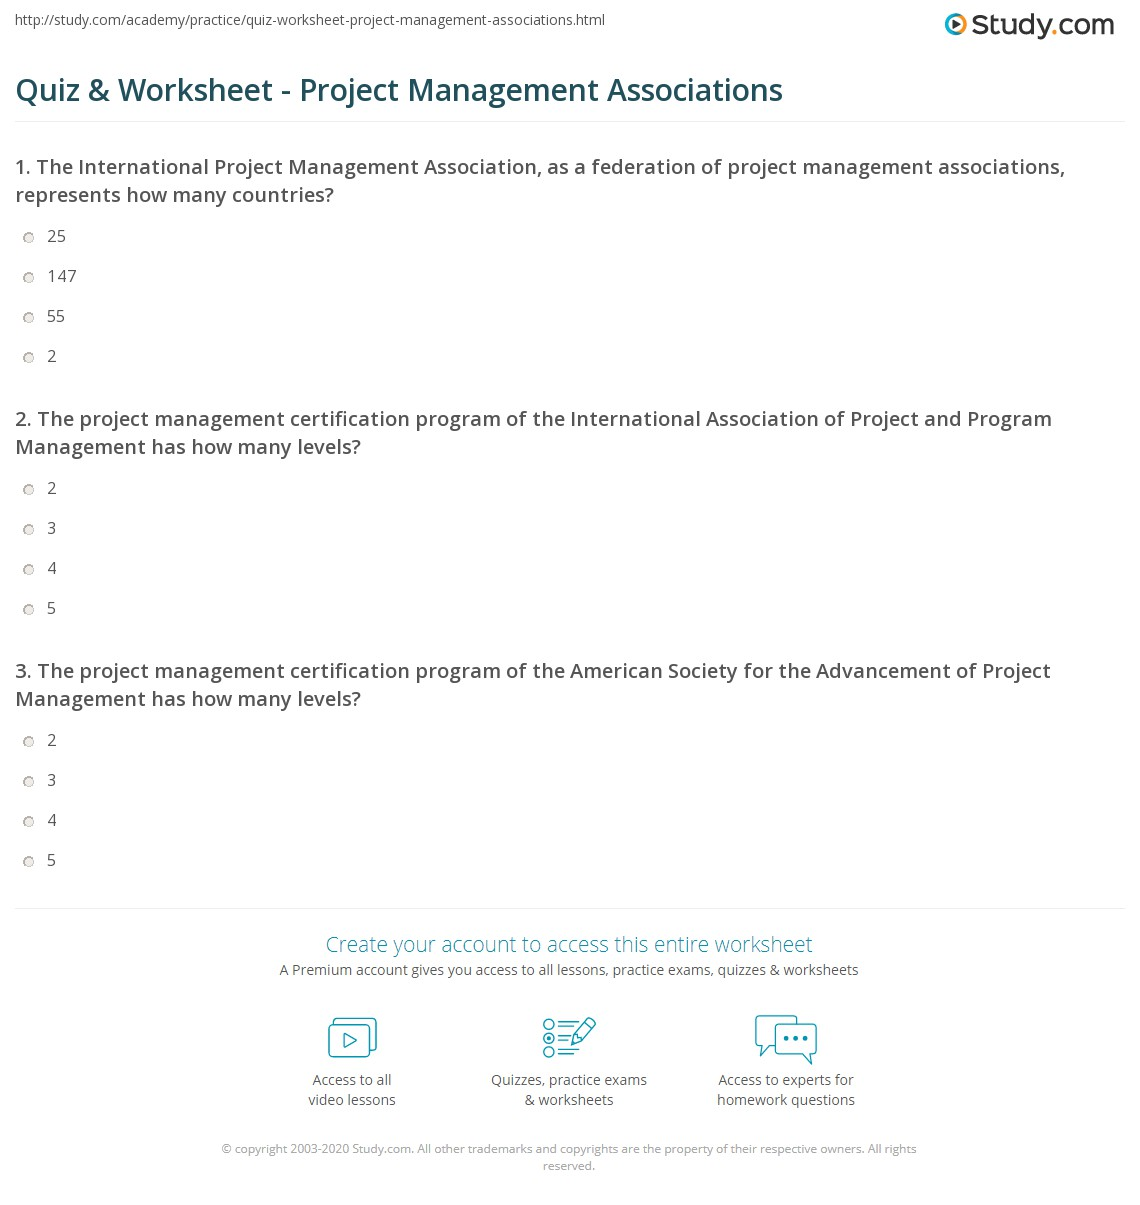 Quiz Worksheet Project Management Associations Study